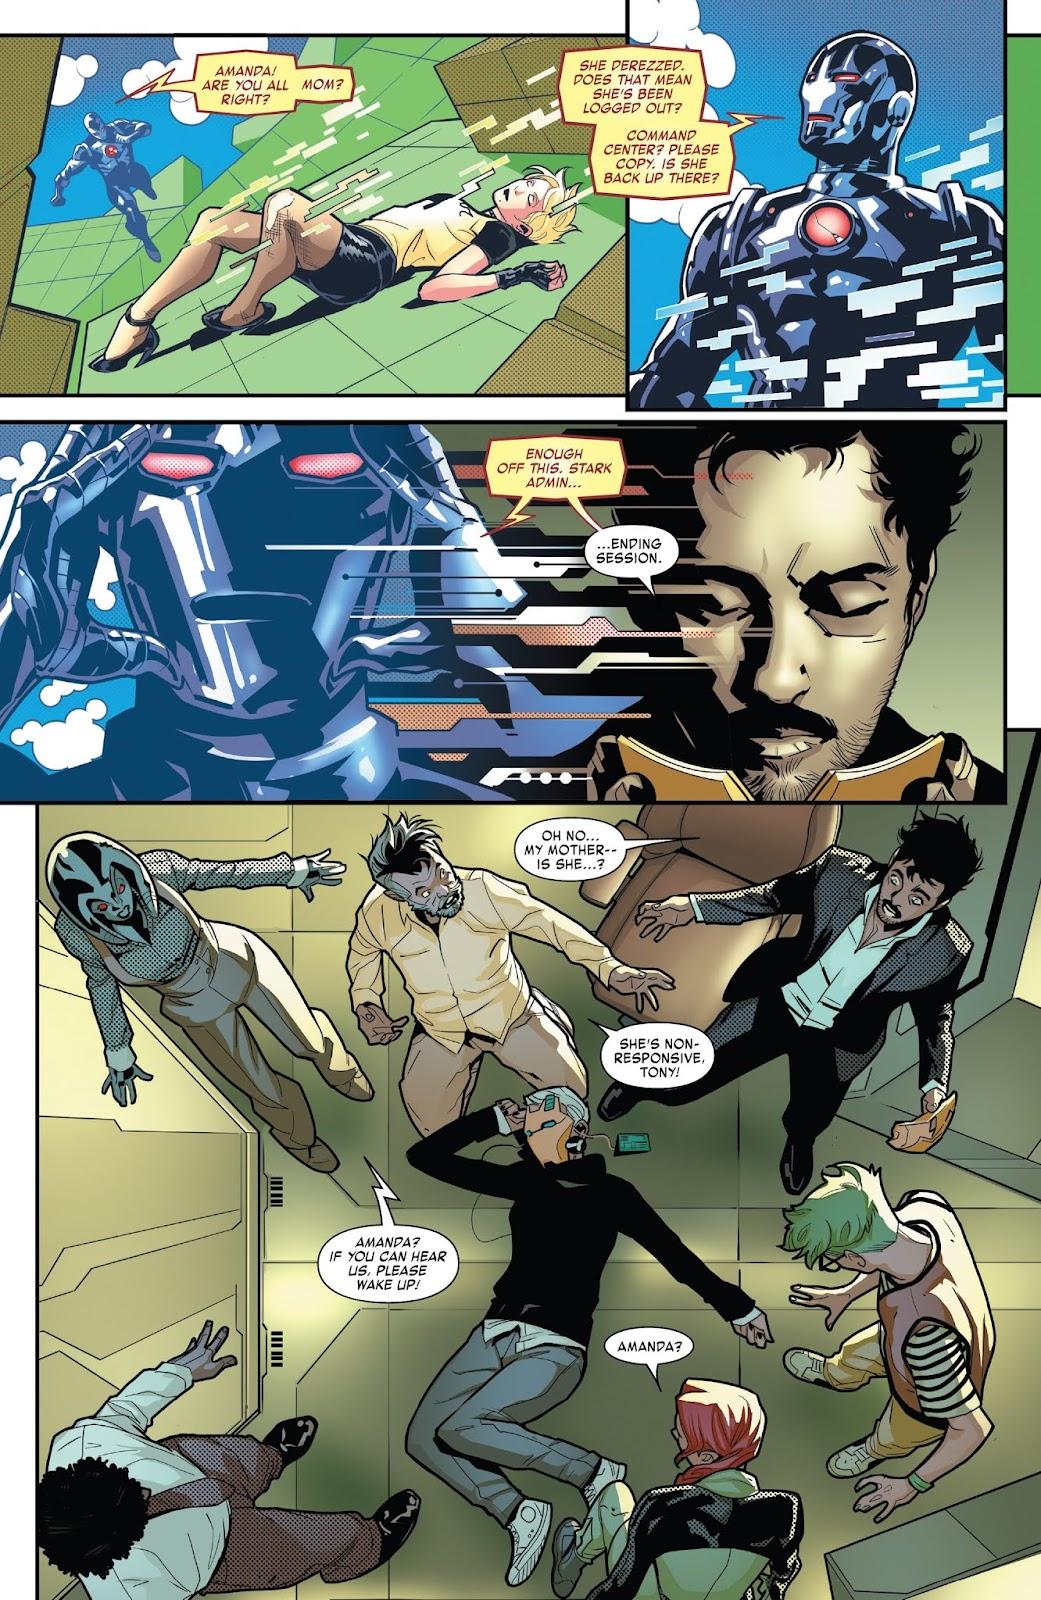 Read online Tony Stark: Iron Man comic -  Issue #7 - 6